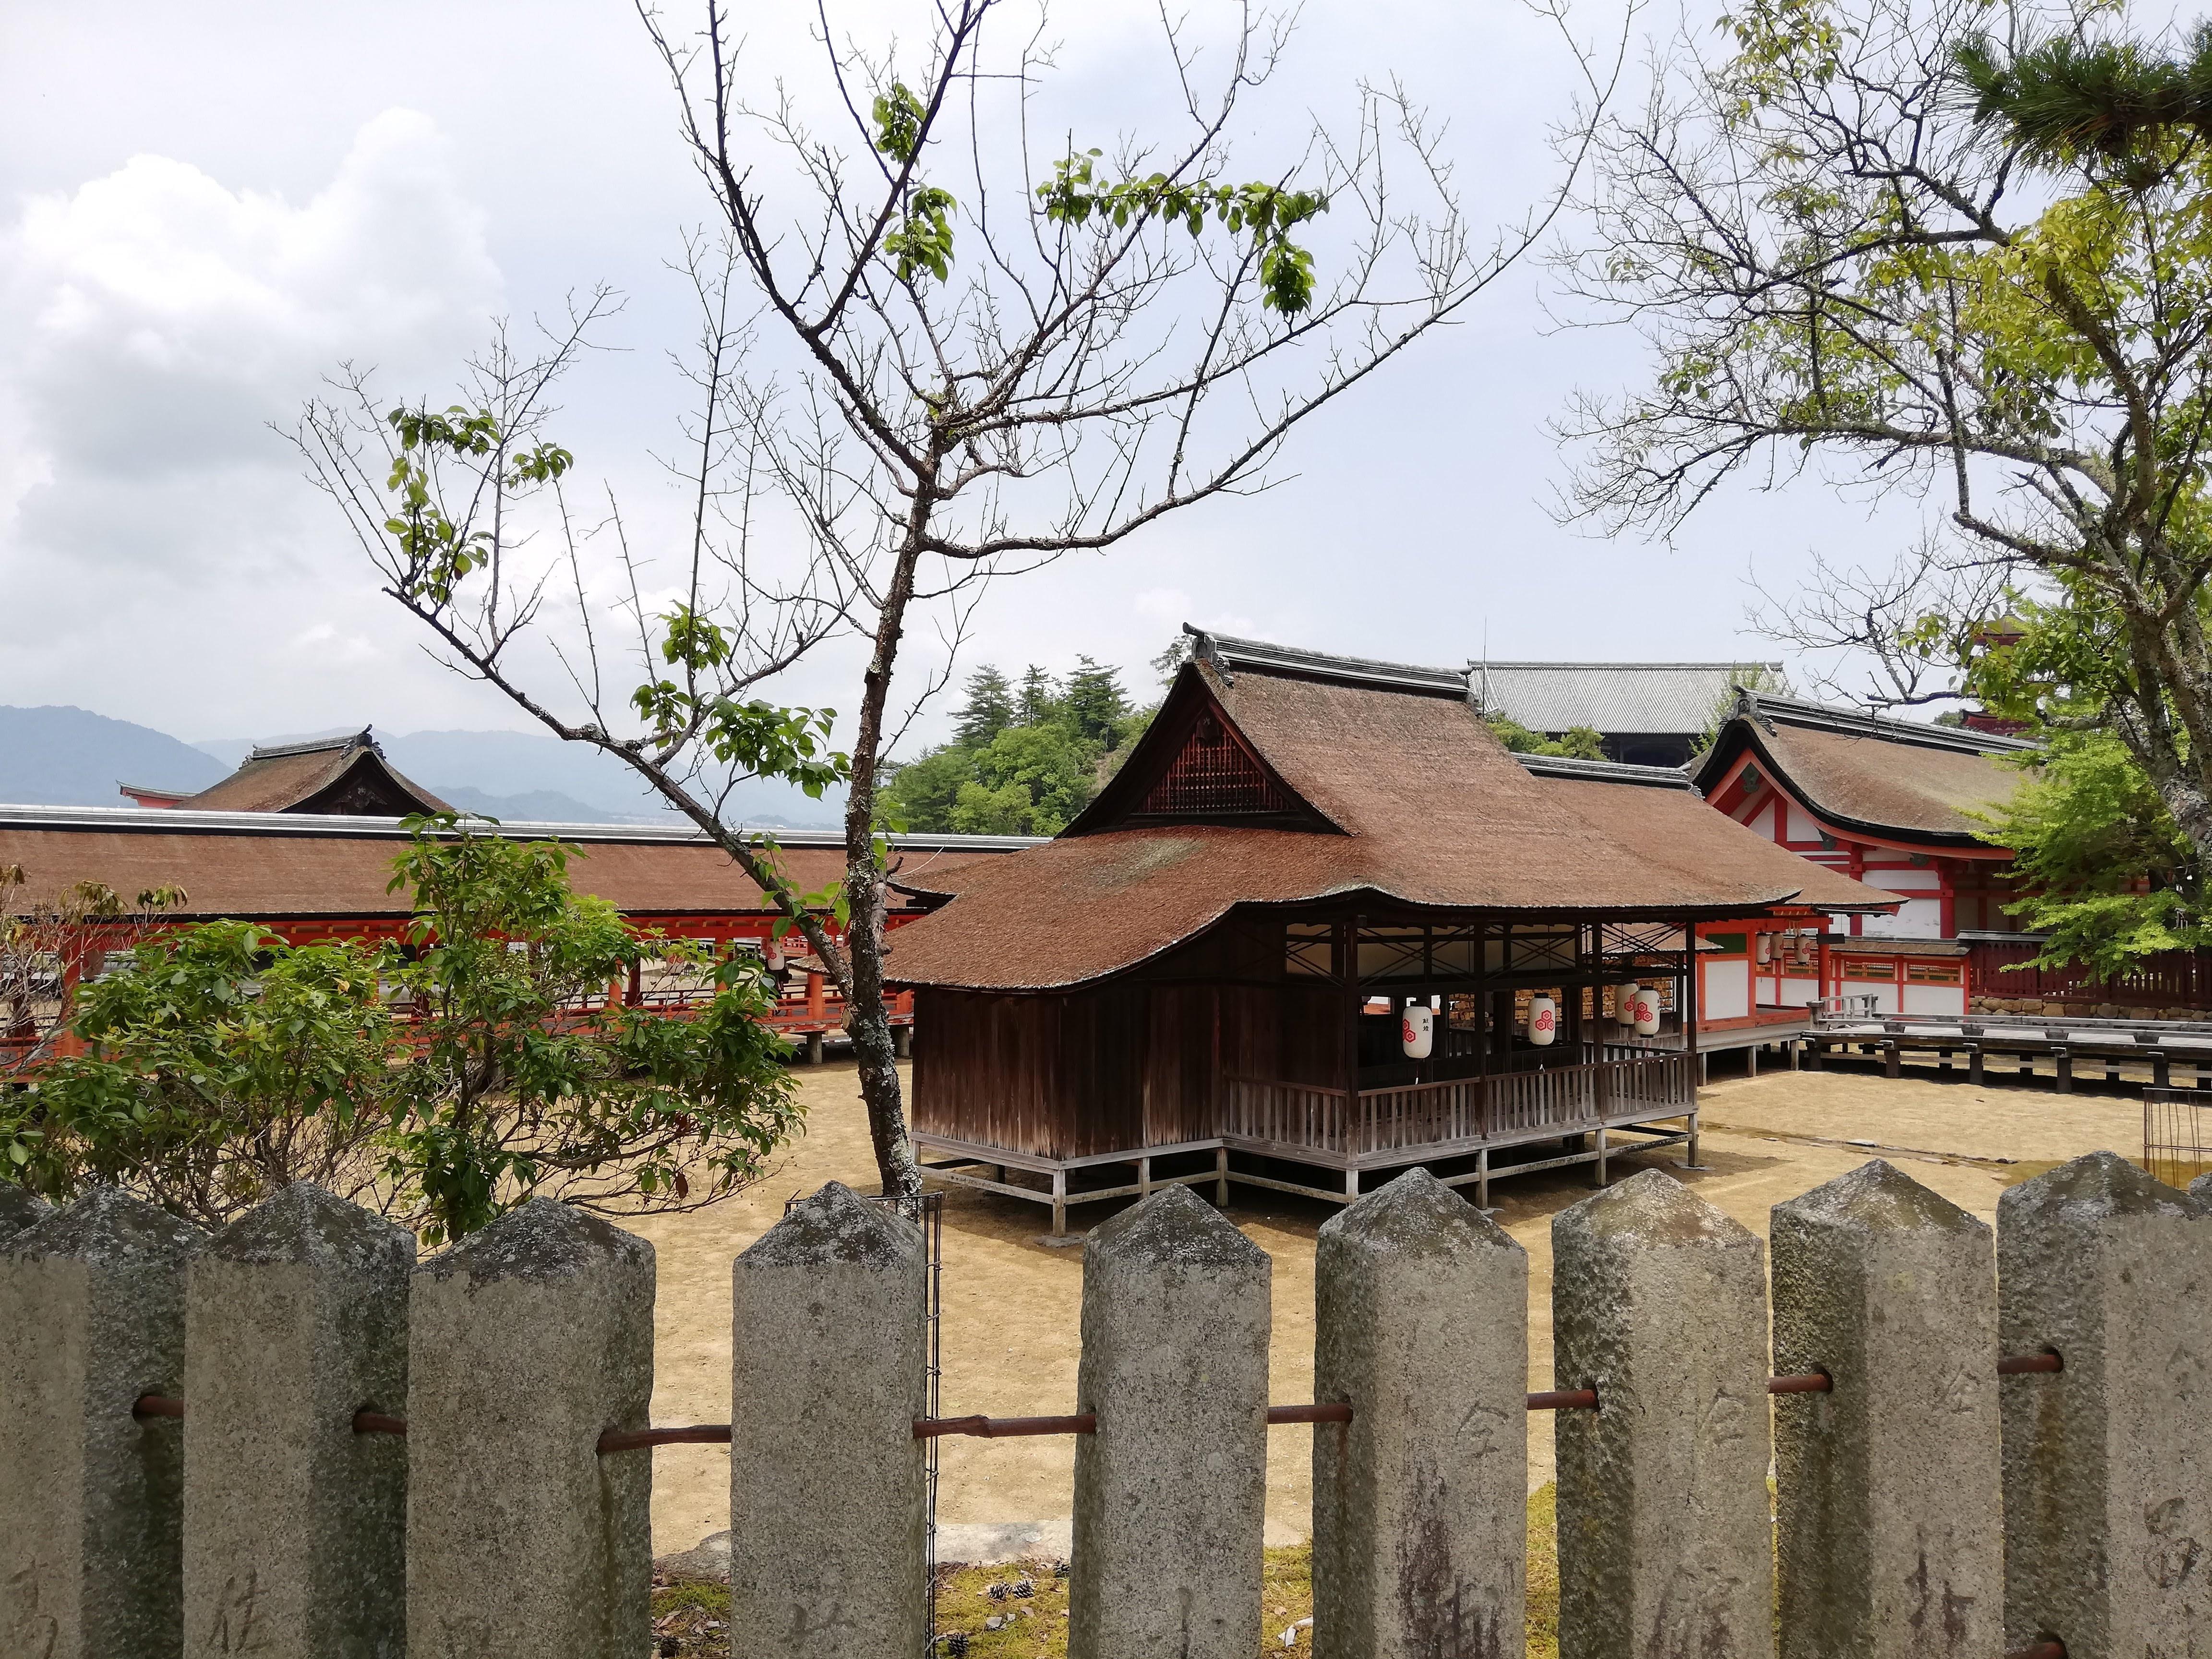 宮島の風景写真